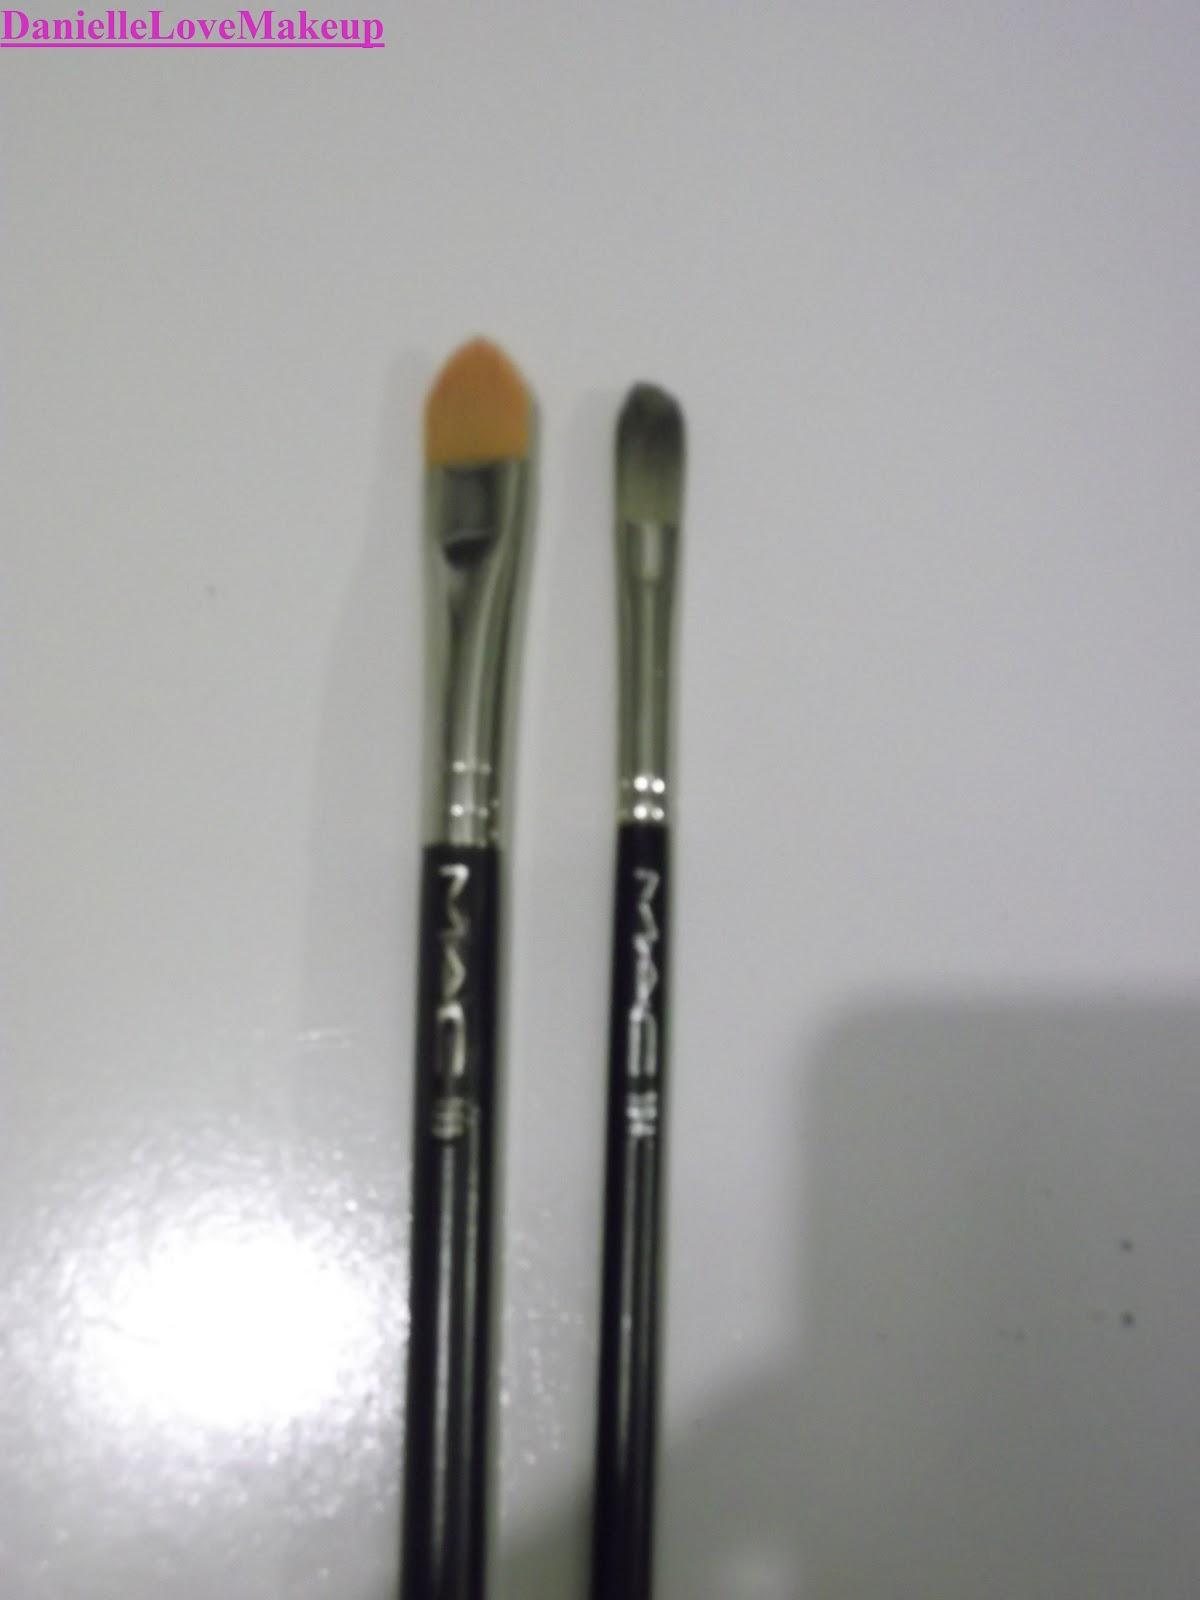 Mac 182 Buffer Brush Reviews Photos Ingredients: DanielleLoveMakeup: My Current MAC Brush Collection